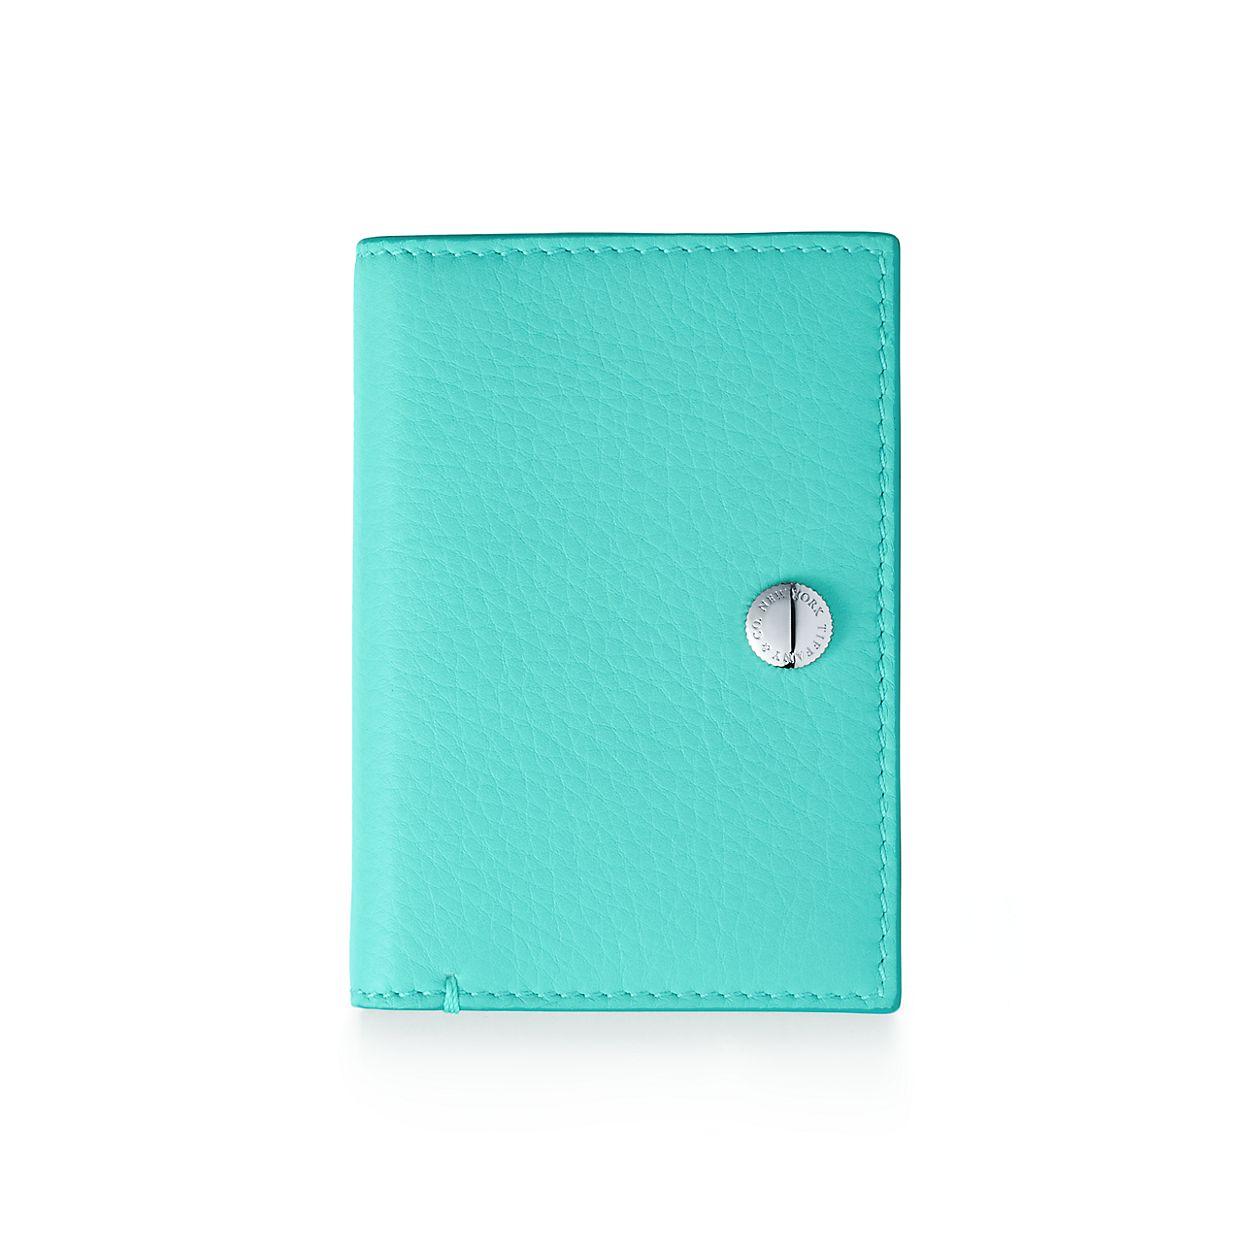 Vertical folded card case in Tiffany Blue® grain calfskin leather ...